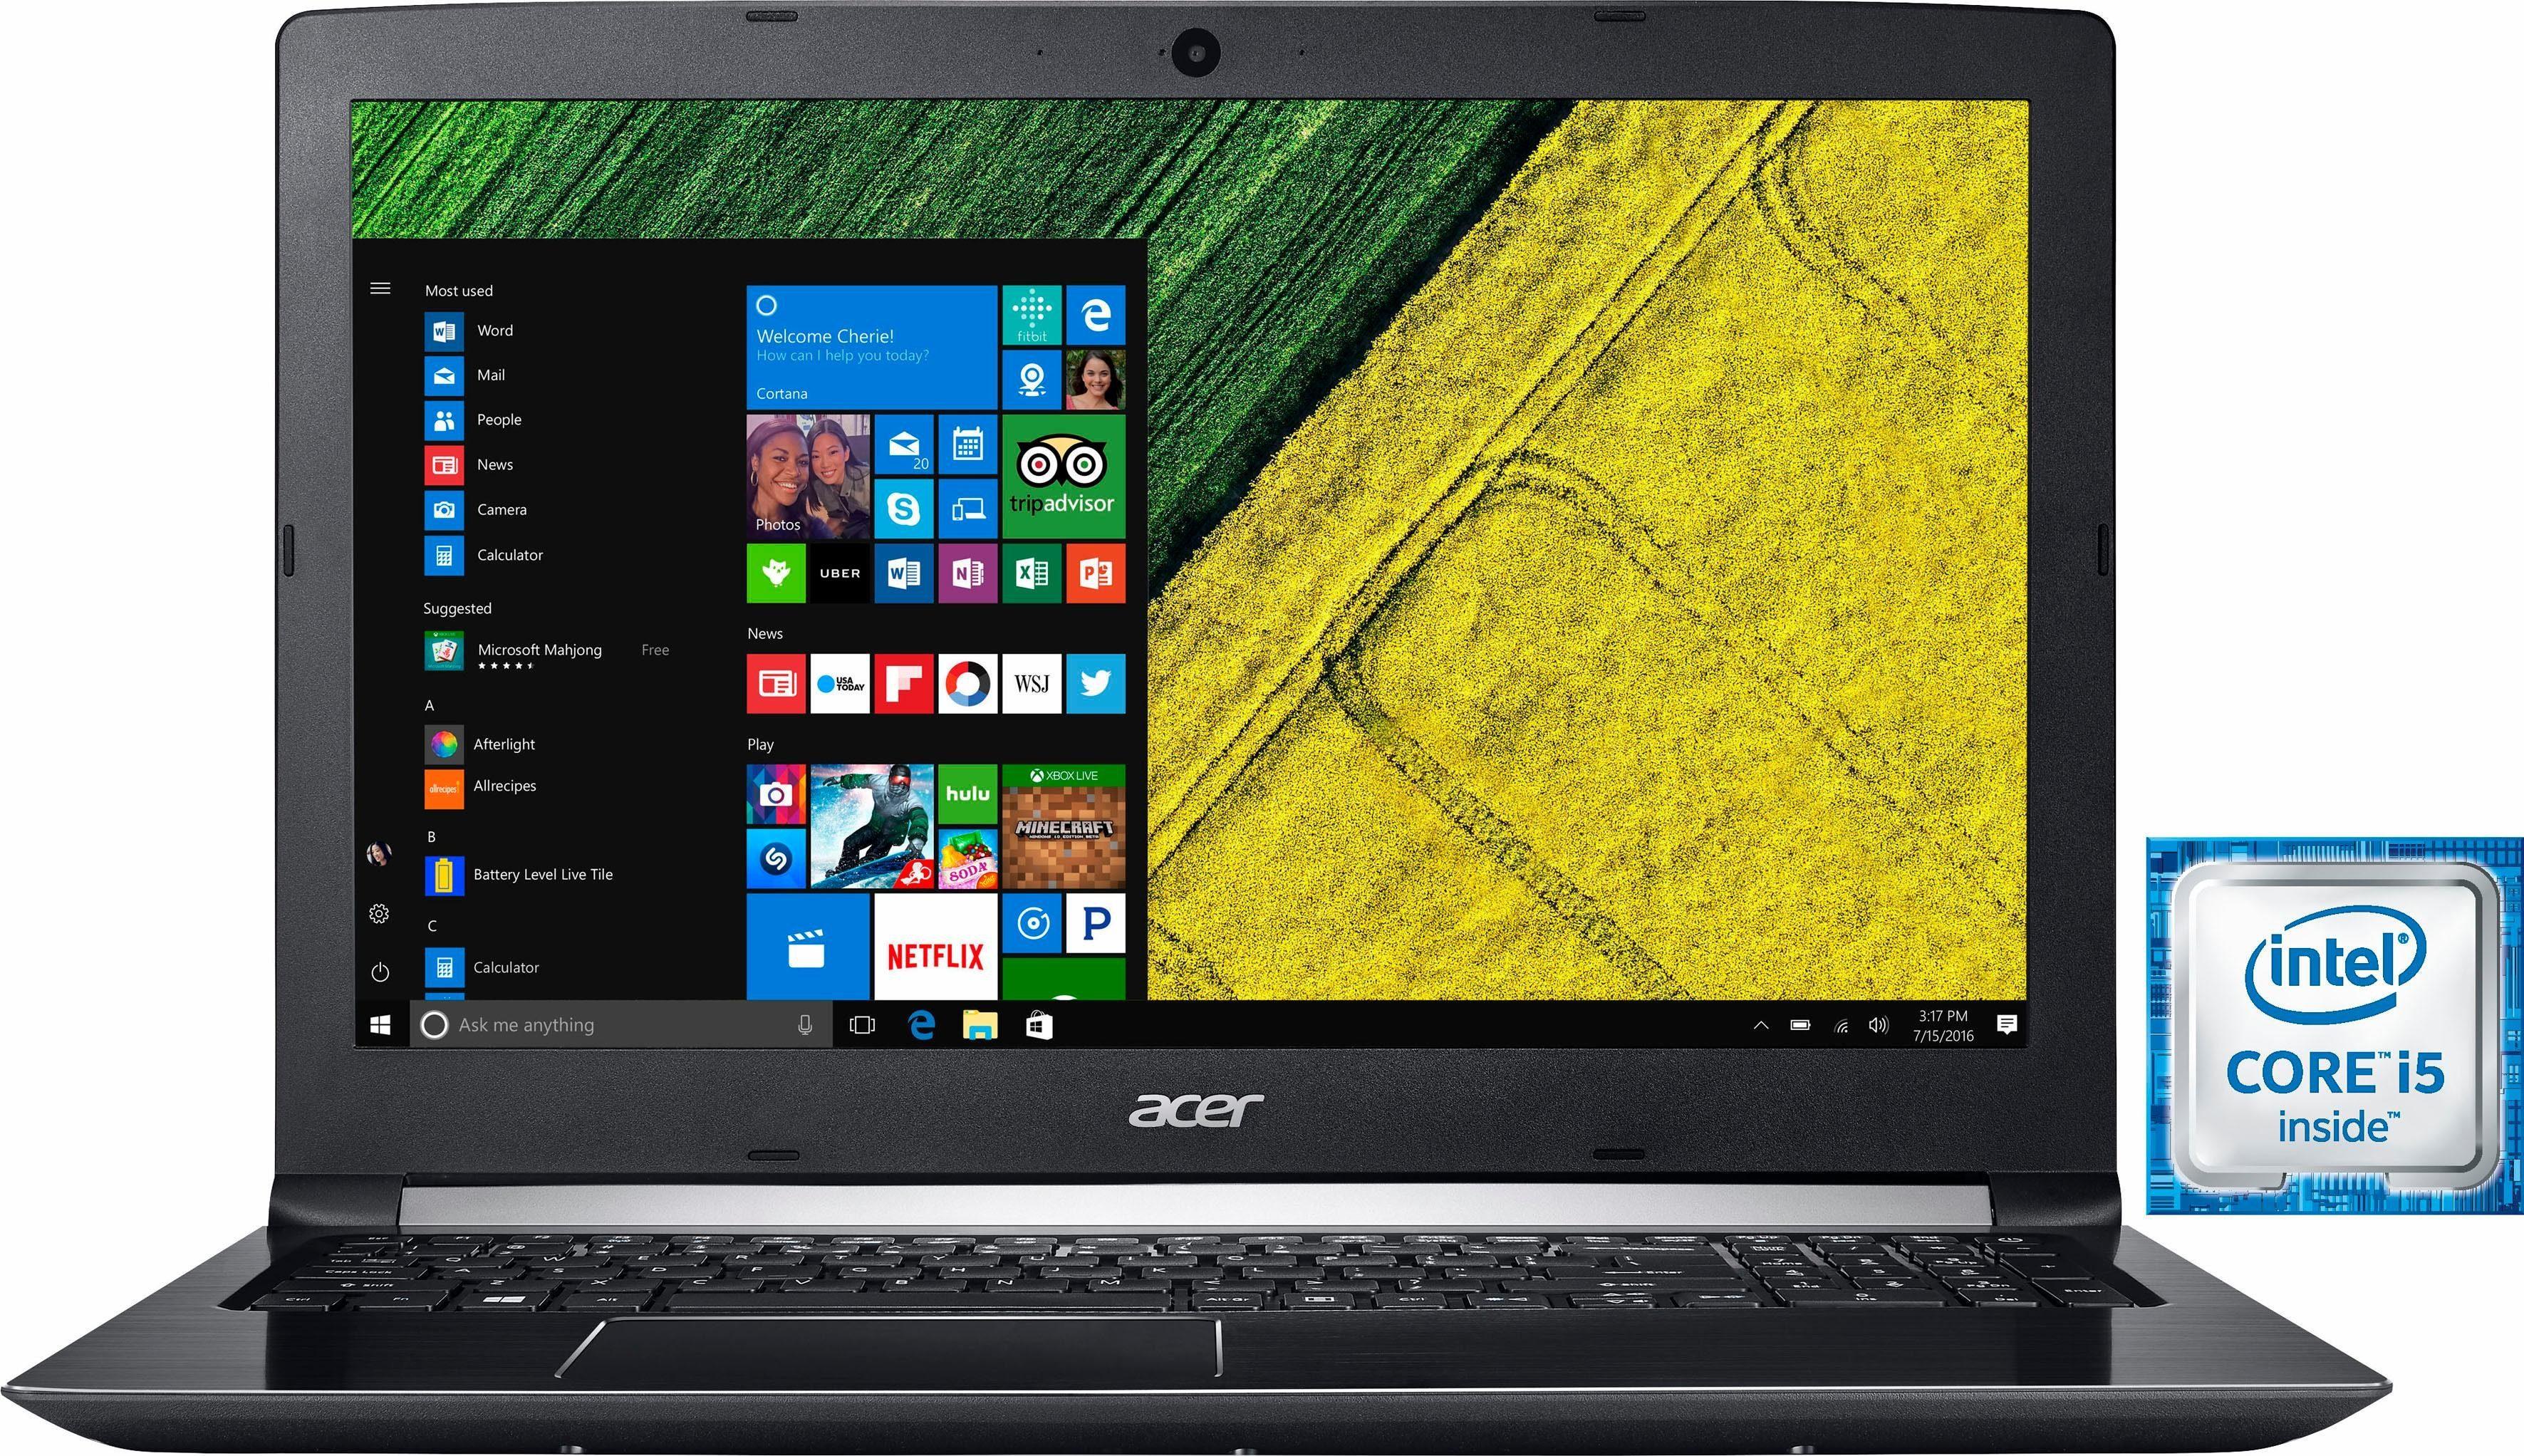 Acer Aspire A515-51-58W1 Notebook, Intel® Core™ i5, 39,6 cm (15,6 Zoll), 256 GB Speicher